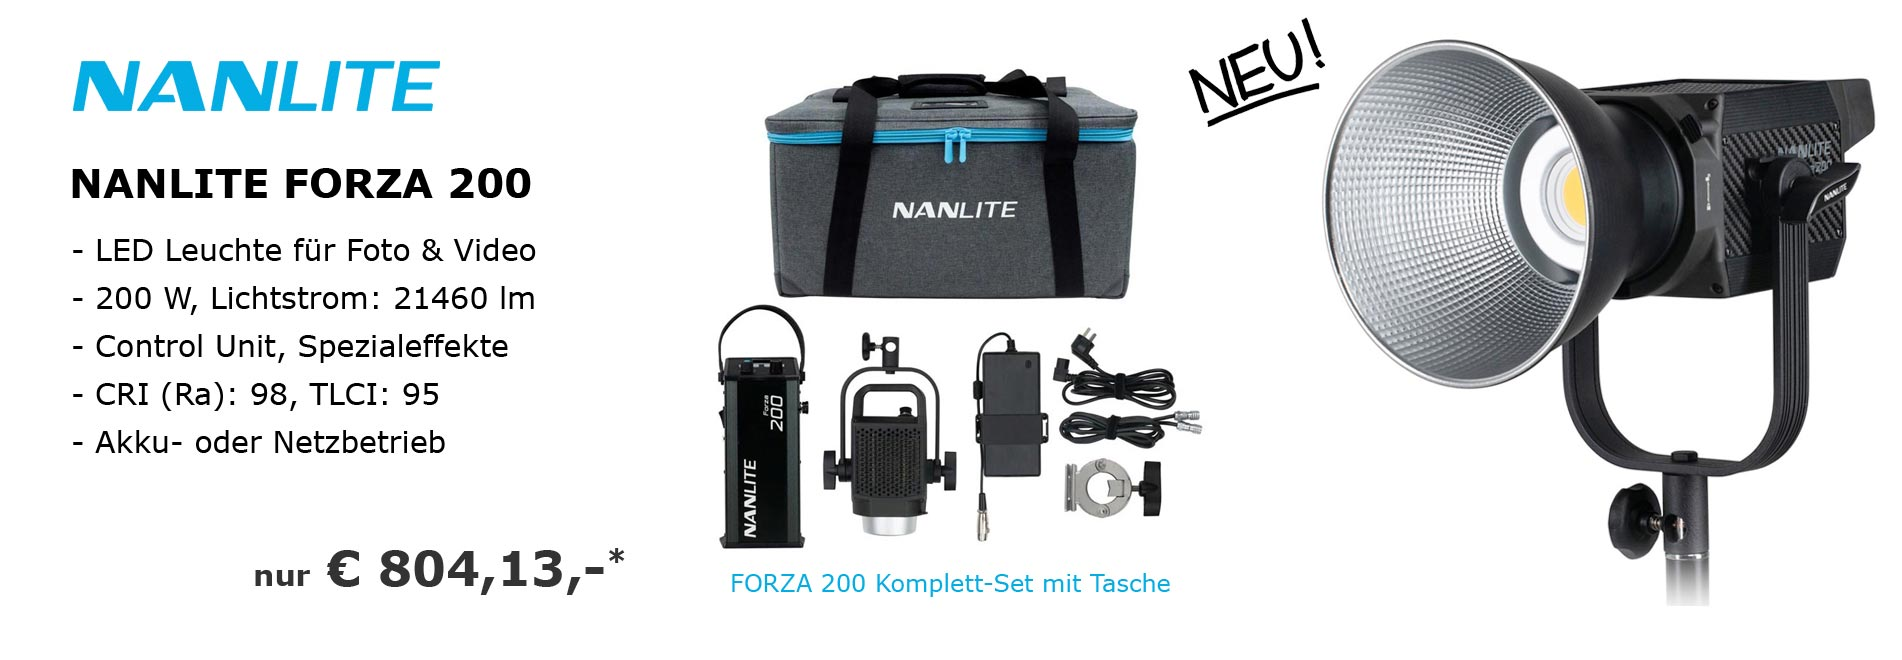 NANLITE FORZA 200 LED Studio-Leuchte für Foto und Video